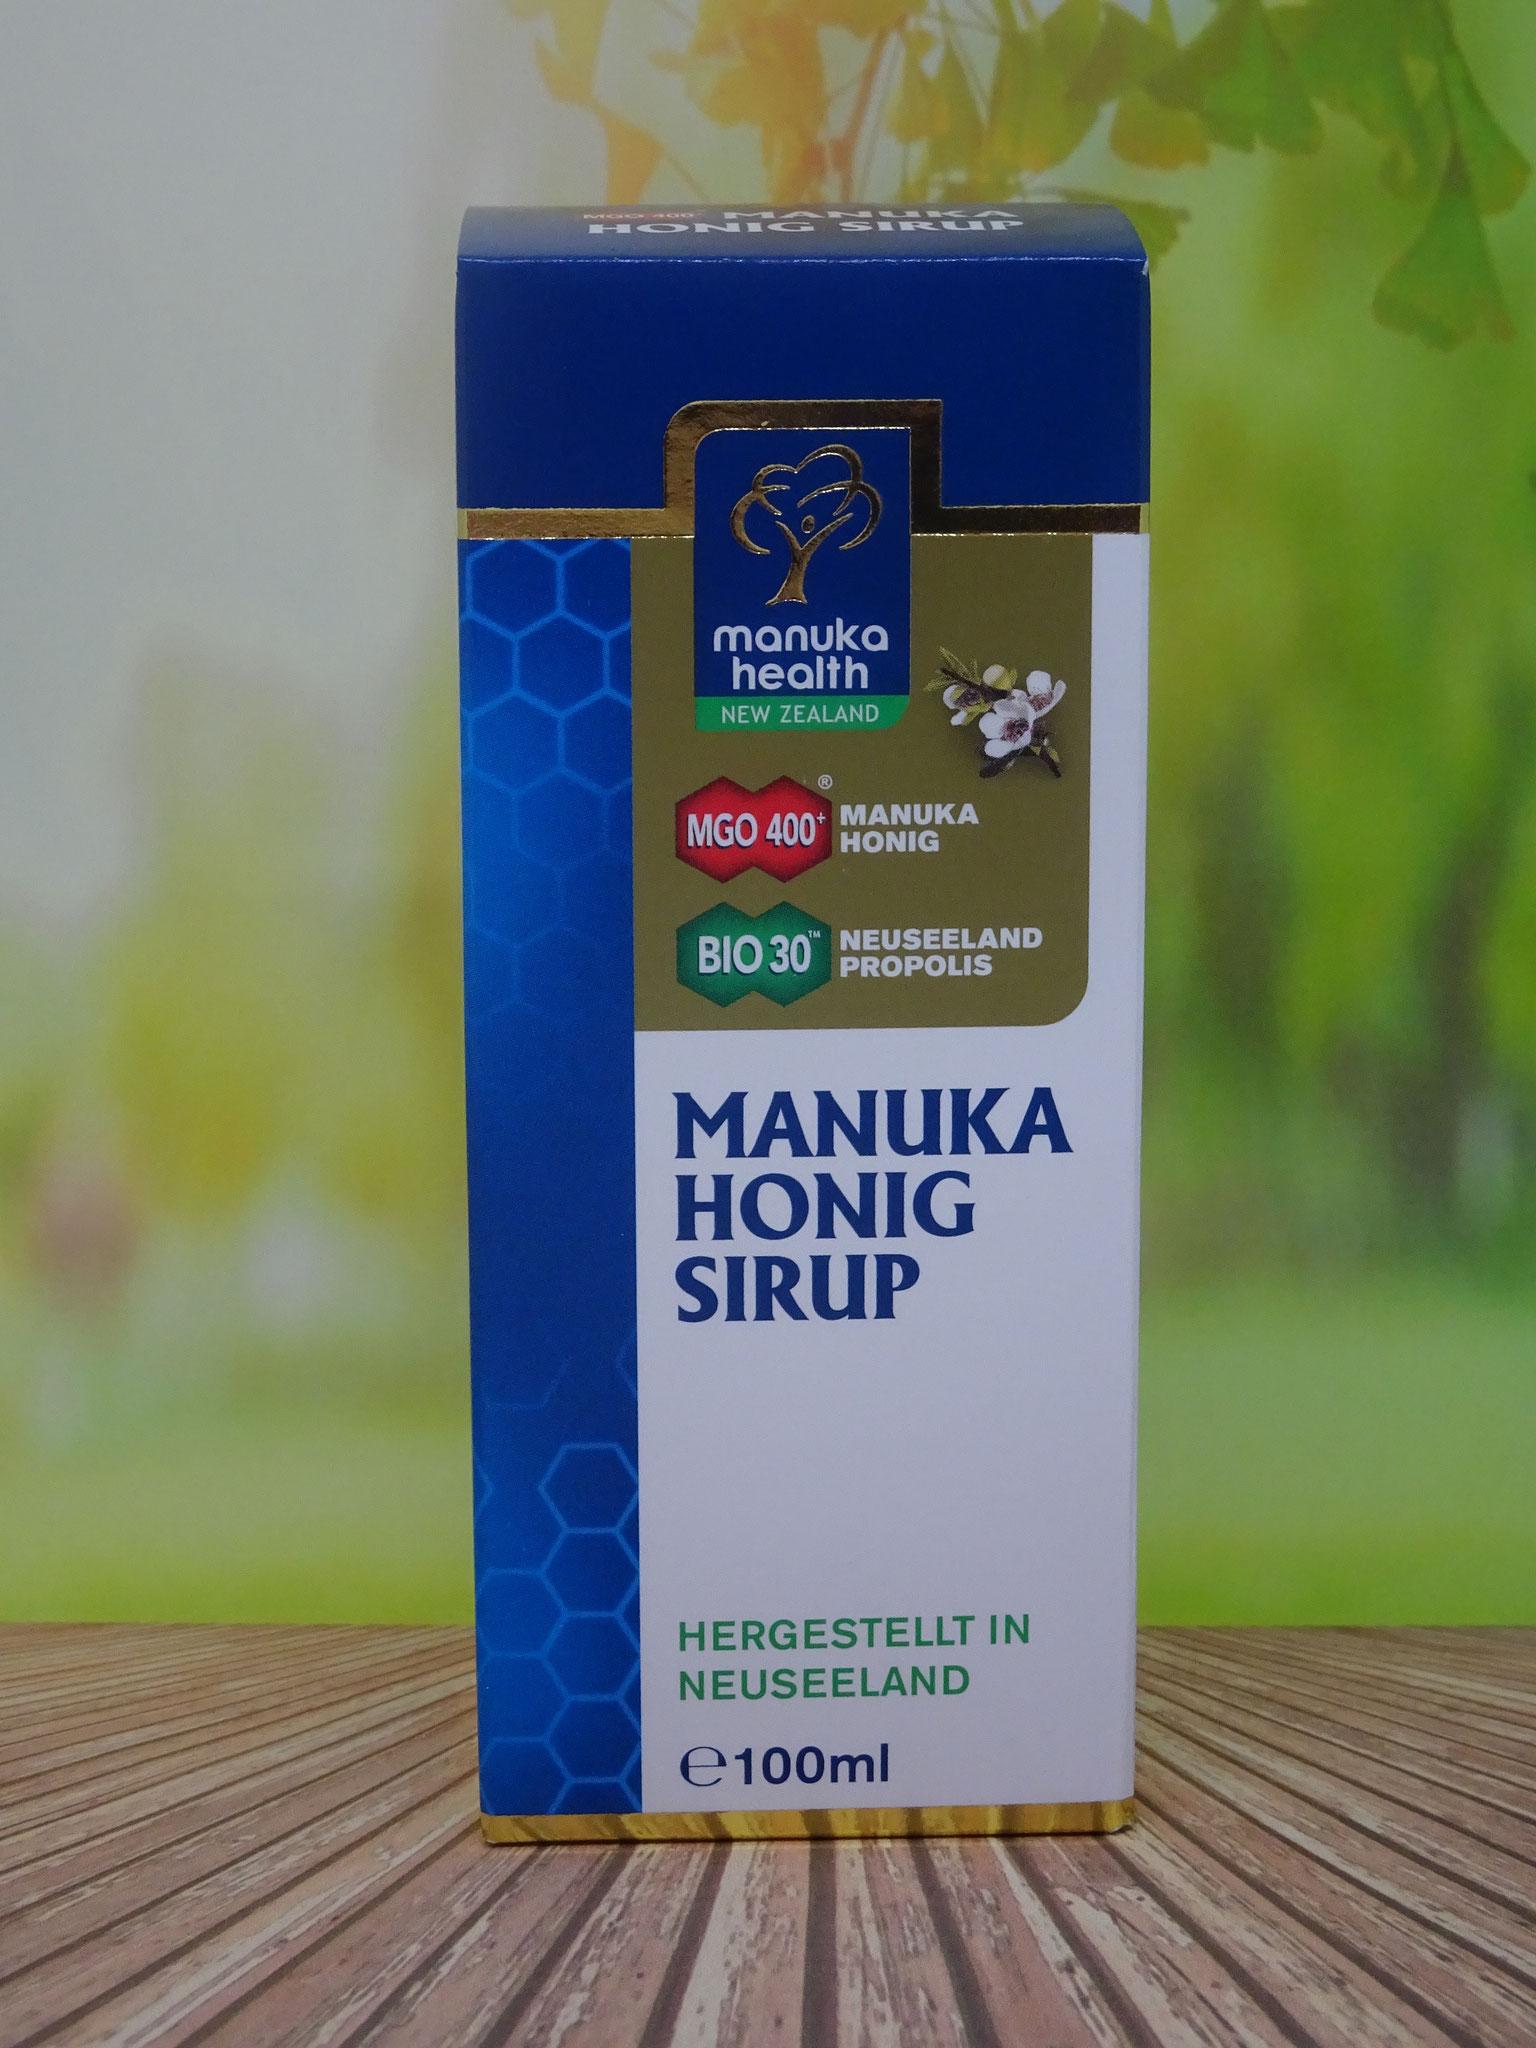 Manuka Honig Sirup für Erwachsene MGO 400 100 ml (Manuka Health New Zealand)